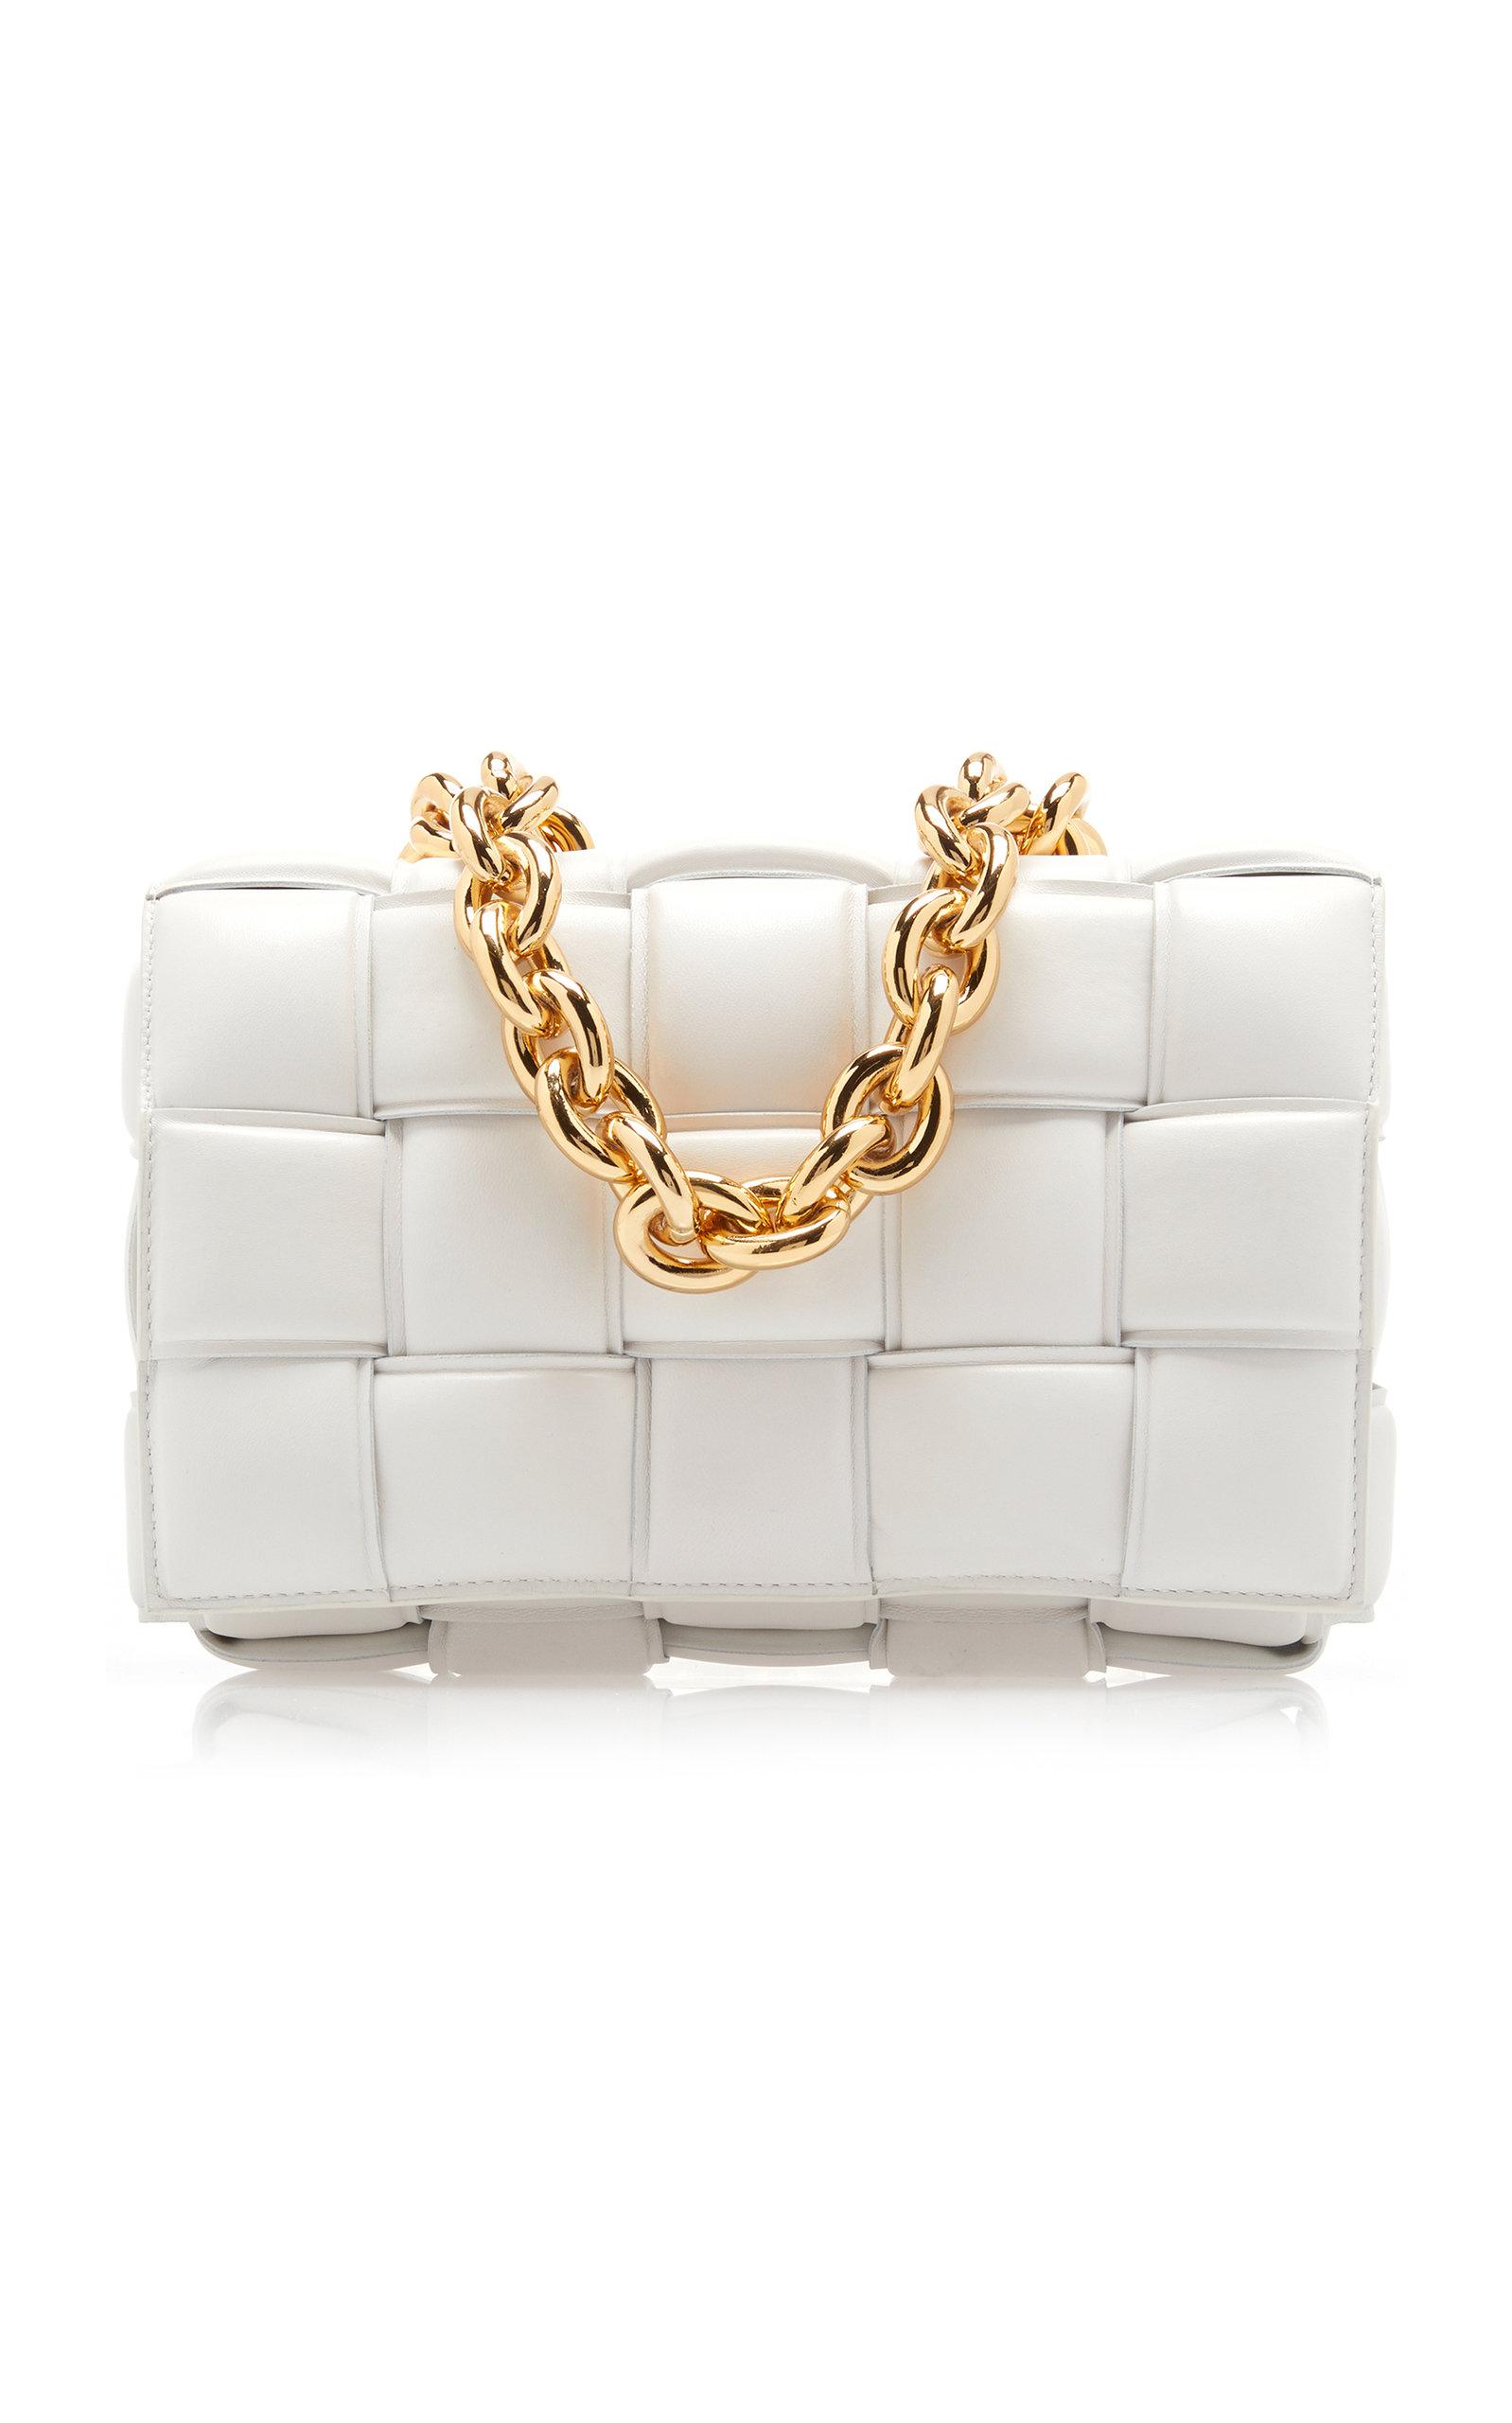 Woven using Bottega Veneta's distinguished intrecciato technique, this creamy white crossbody bag is